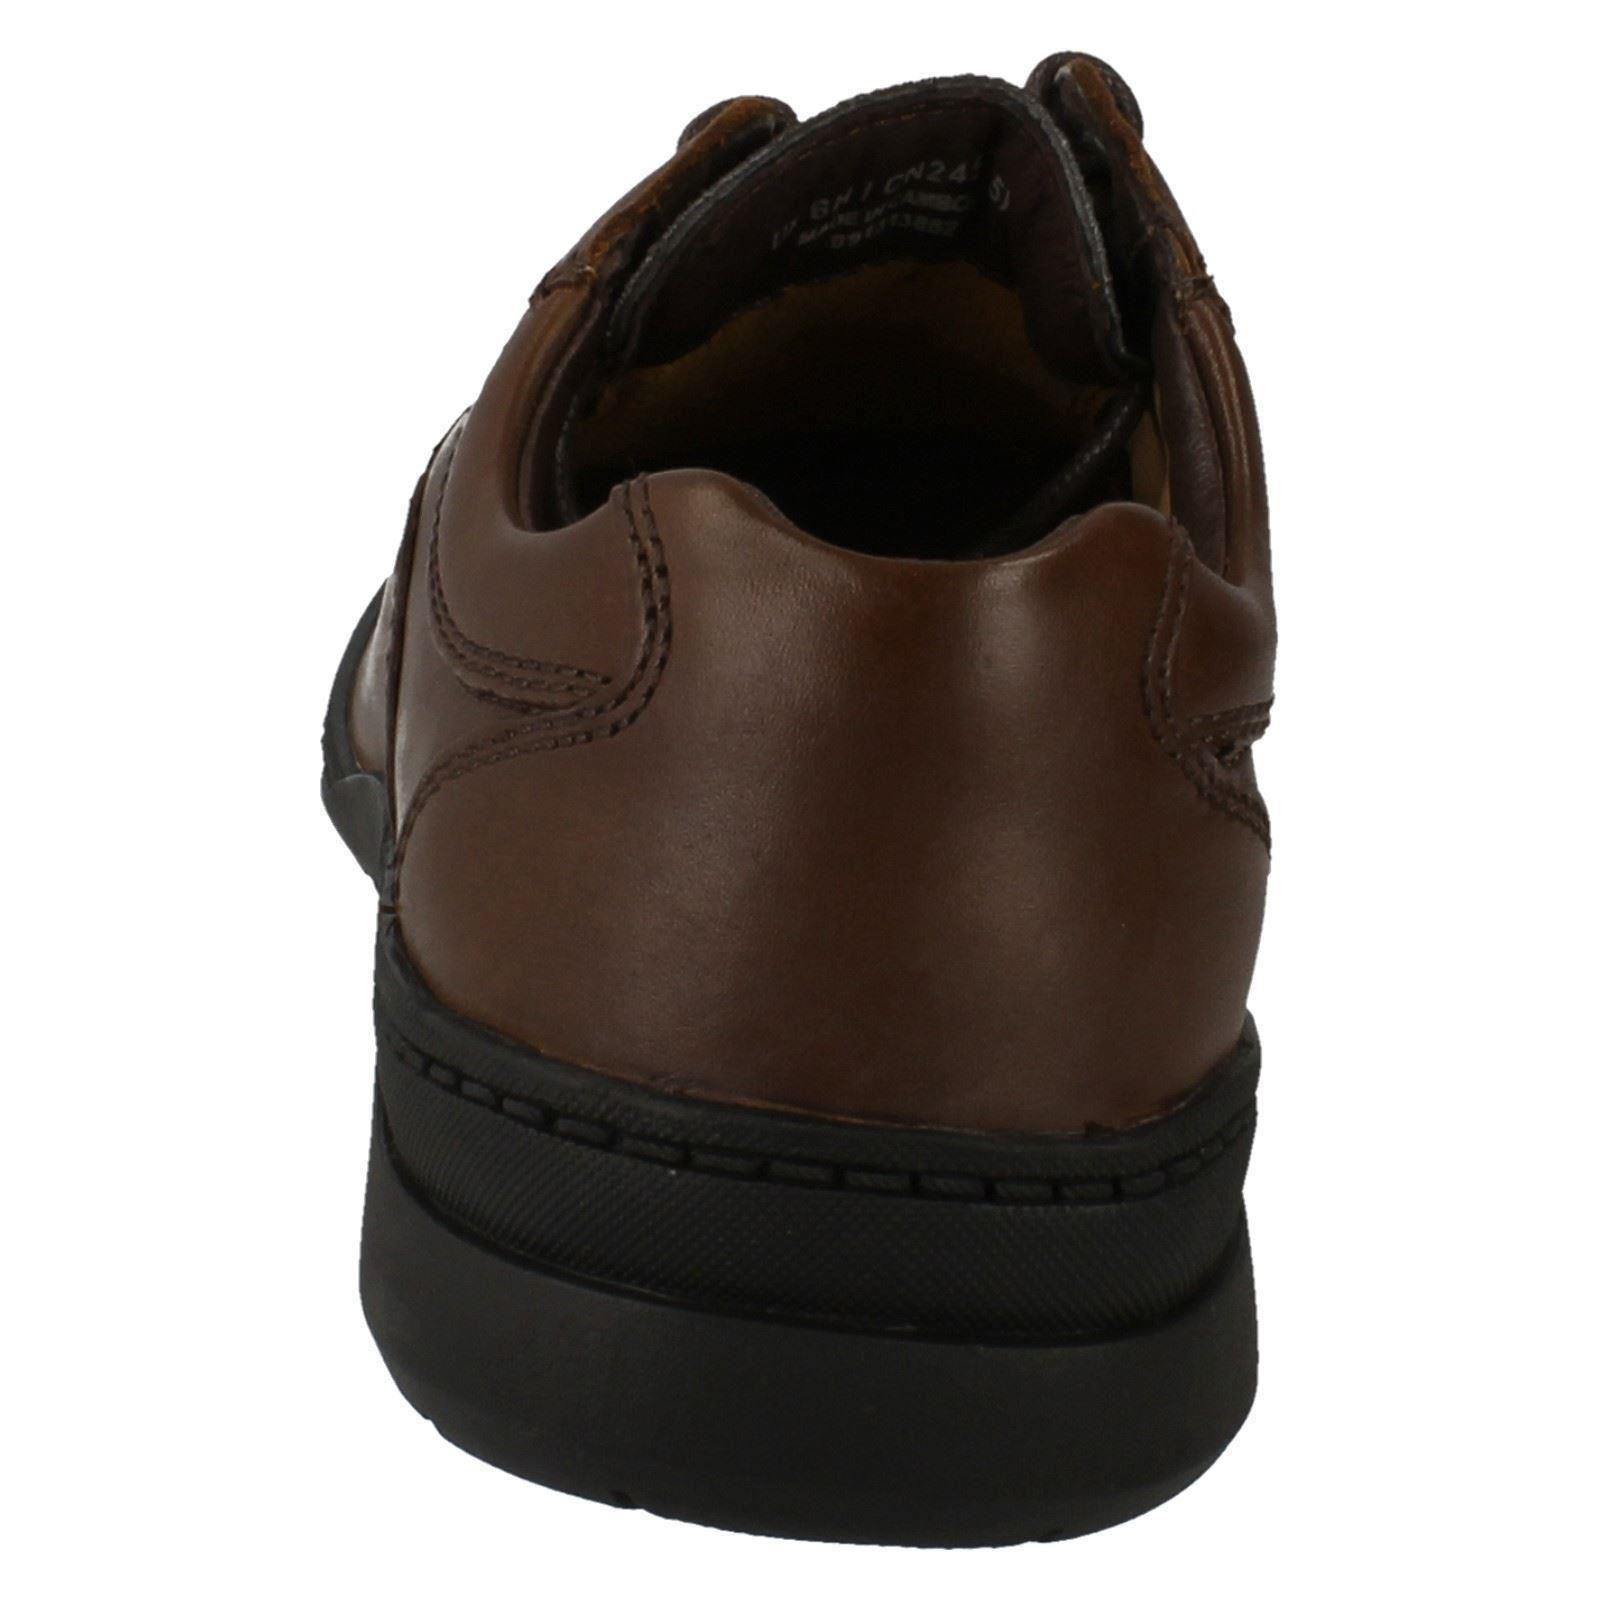 Para Hombre Zapatos Clarks Zapatos Hombre Casuales línea día 5f5327